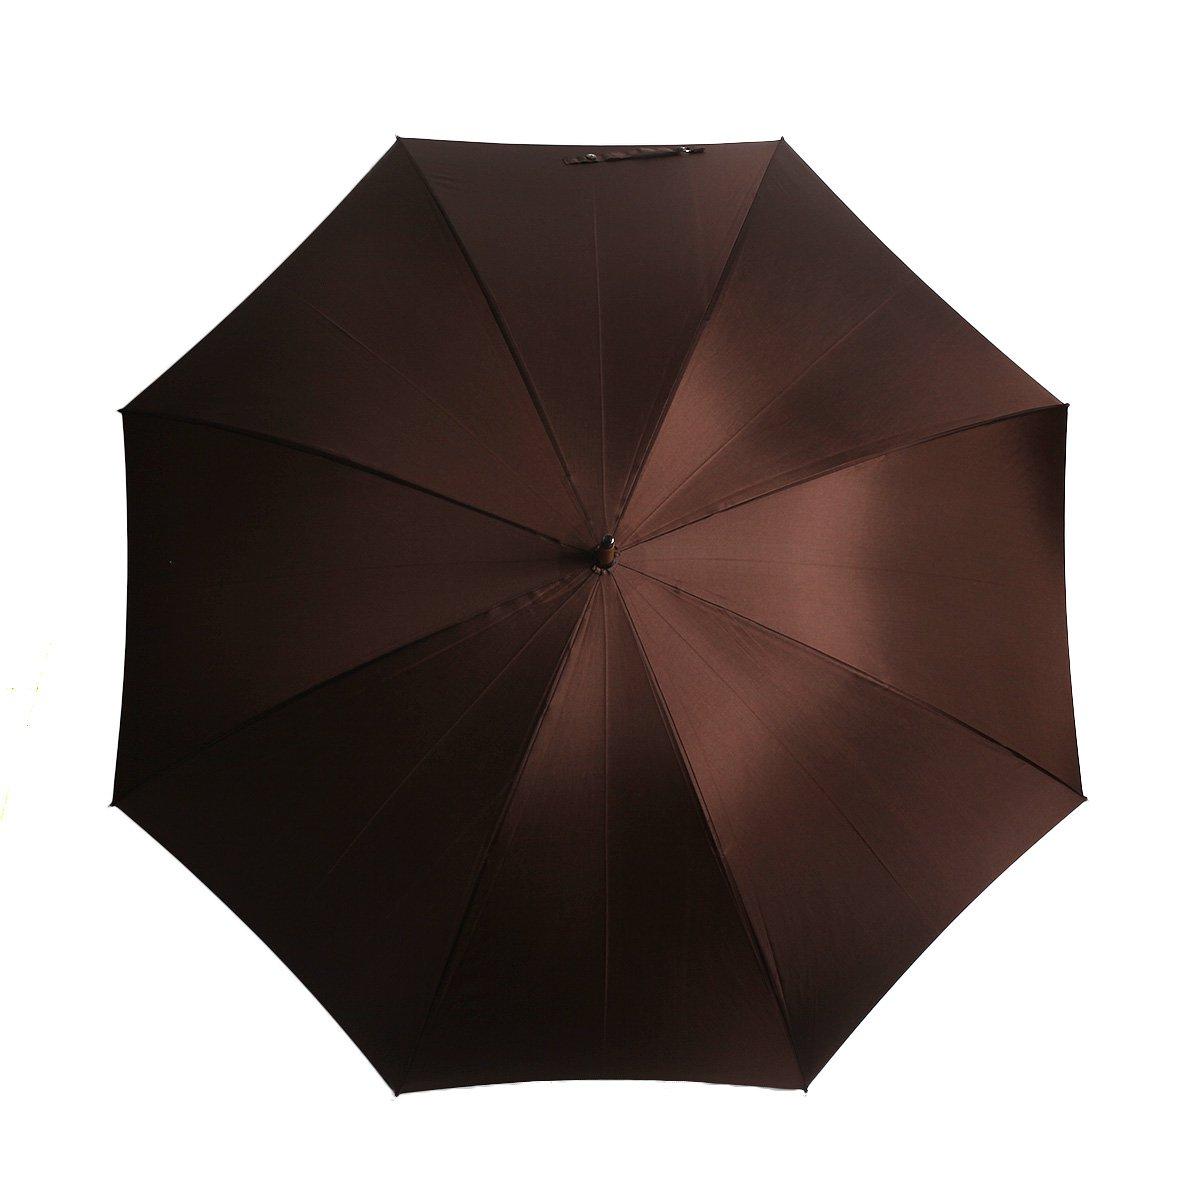 【10%OFF】【公式限定】富士絹 細巻き 長傘(アイアンウッド) 詳細画像8